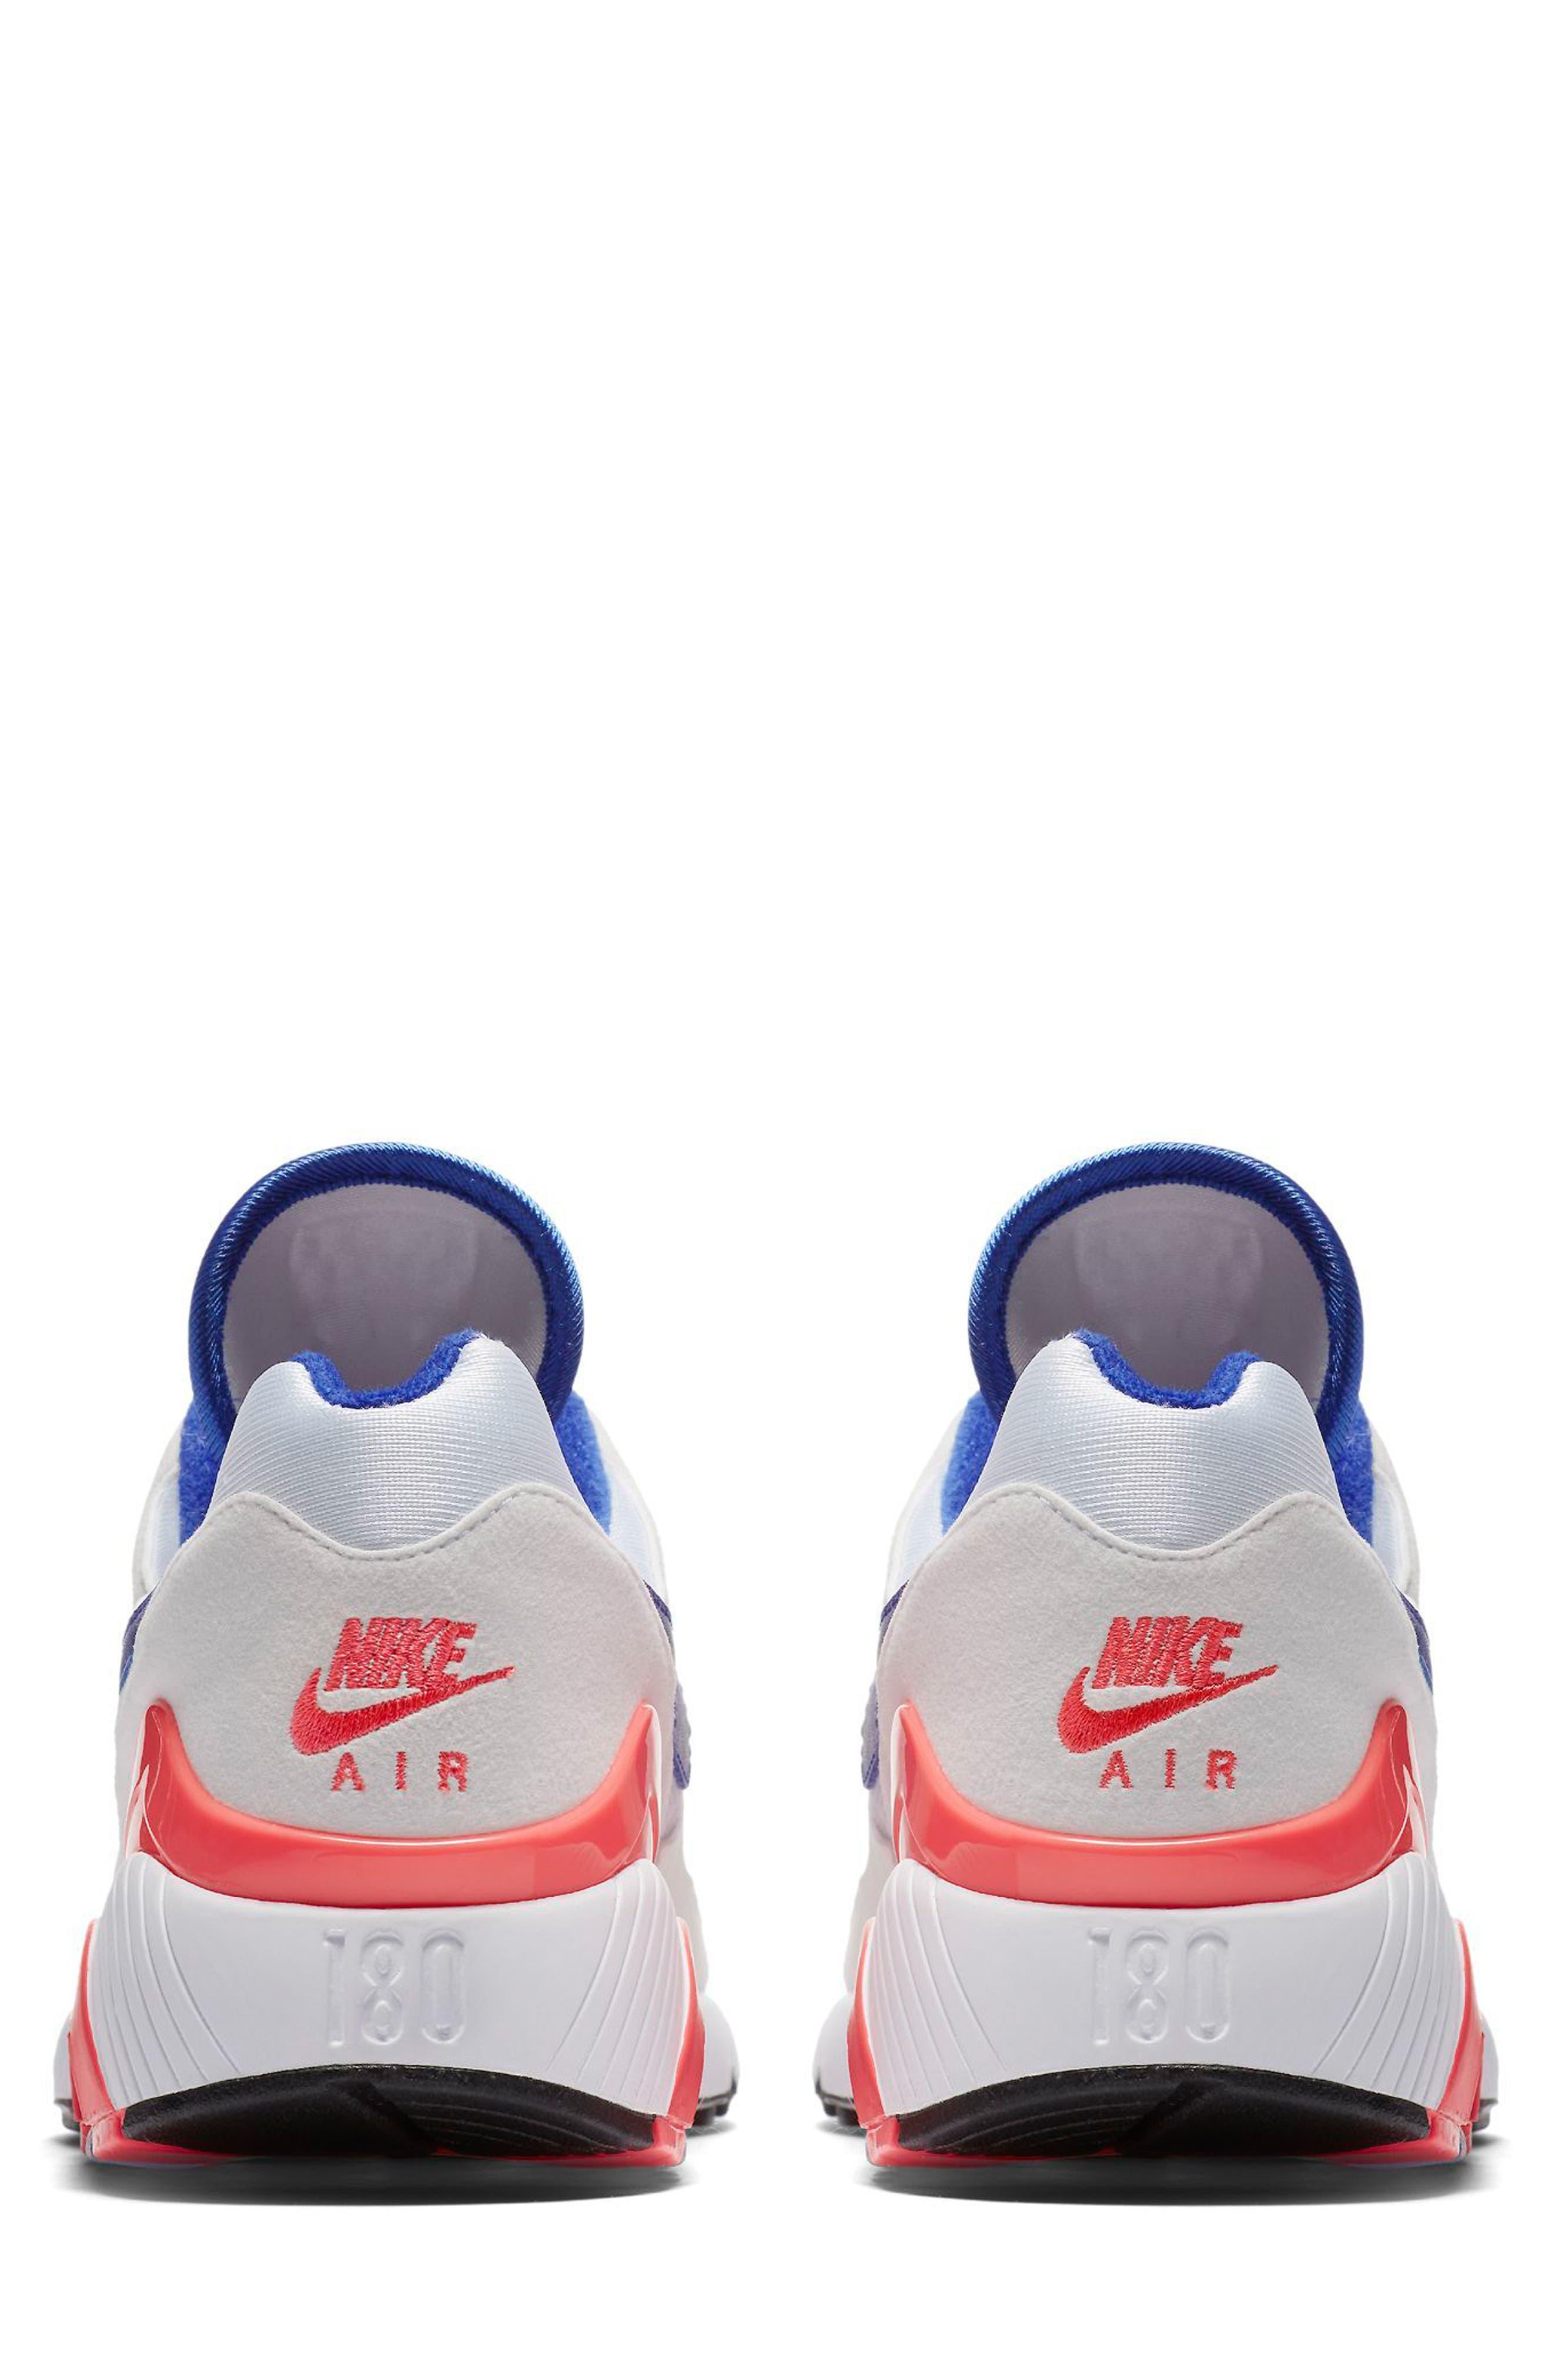 Air Max 180 Sneaker,                             Alternate thumbnail 2, color,                             White/ Ultramarine